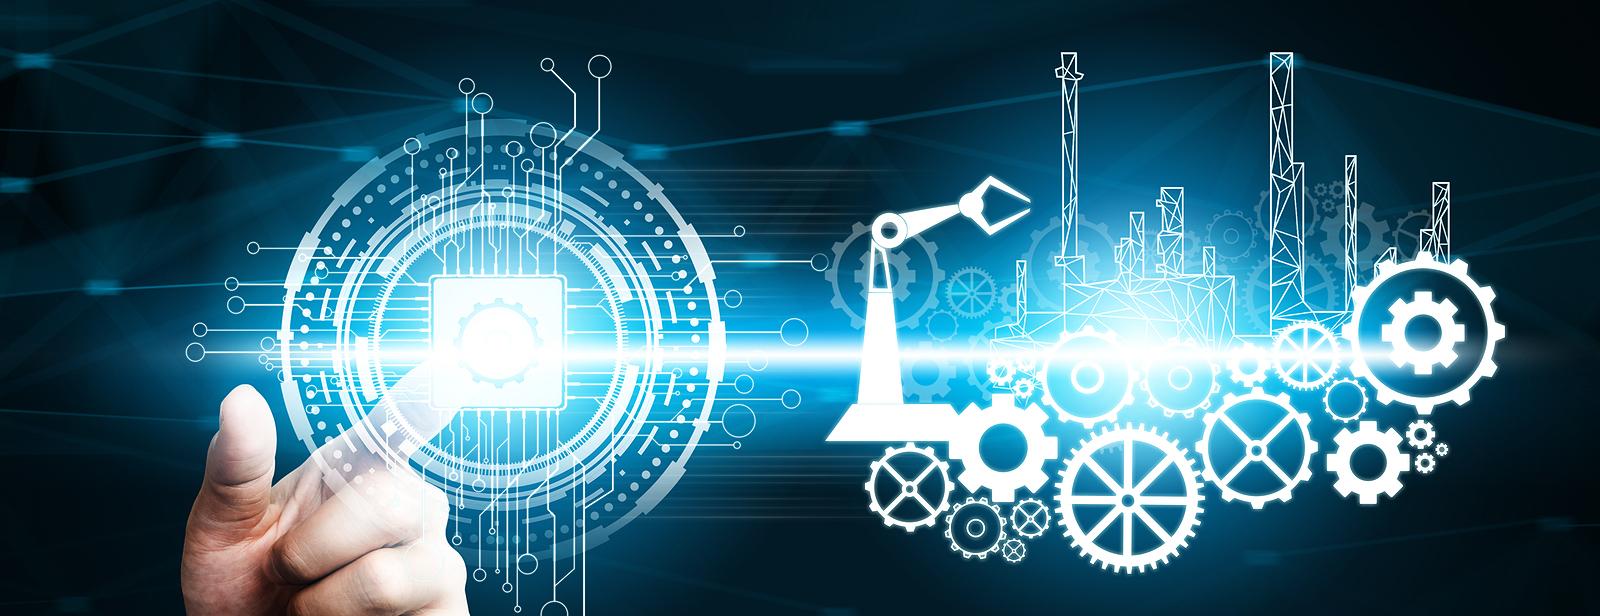 bigstock-futuristic-industry-engine-337214200